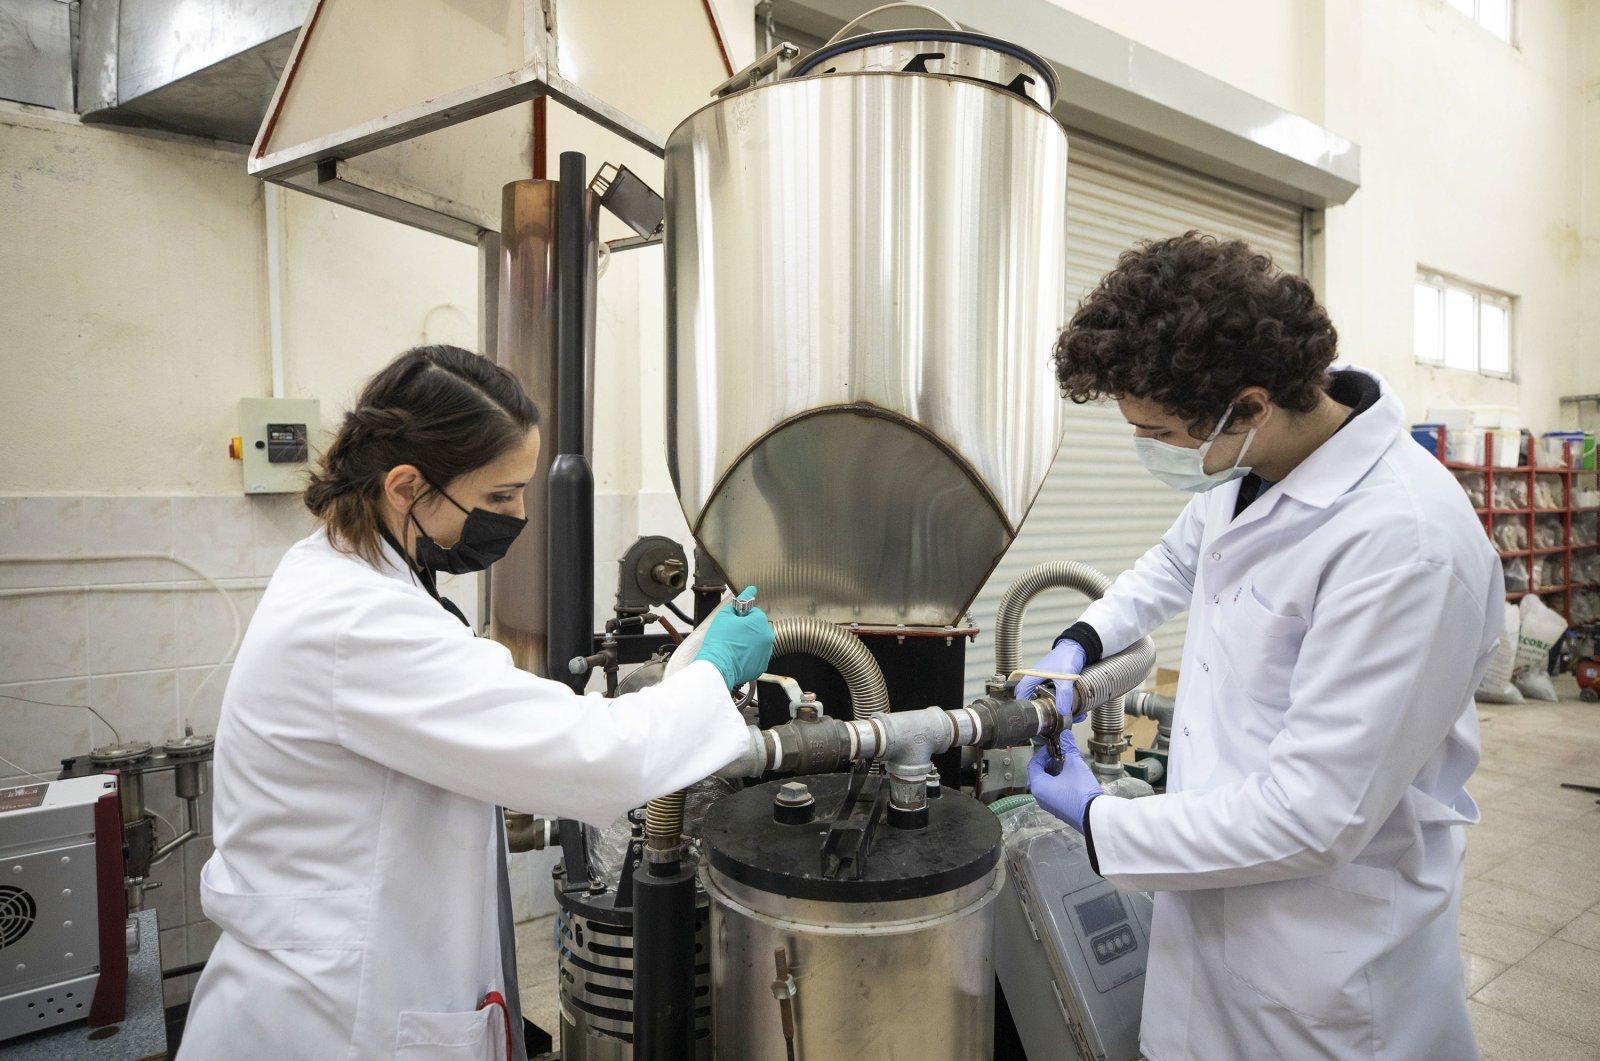 A university team works on the gasification system at Dokuz Eylül University, in Izmir, western Turkey, Jan. 6, 2020. (AA Photo)